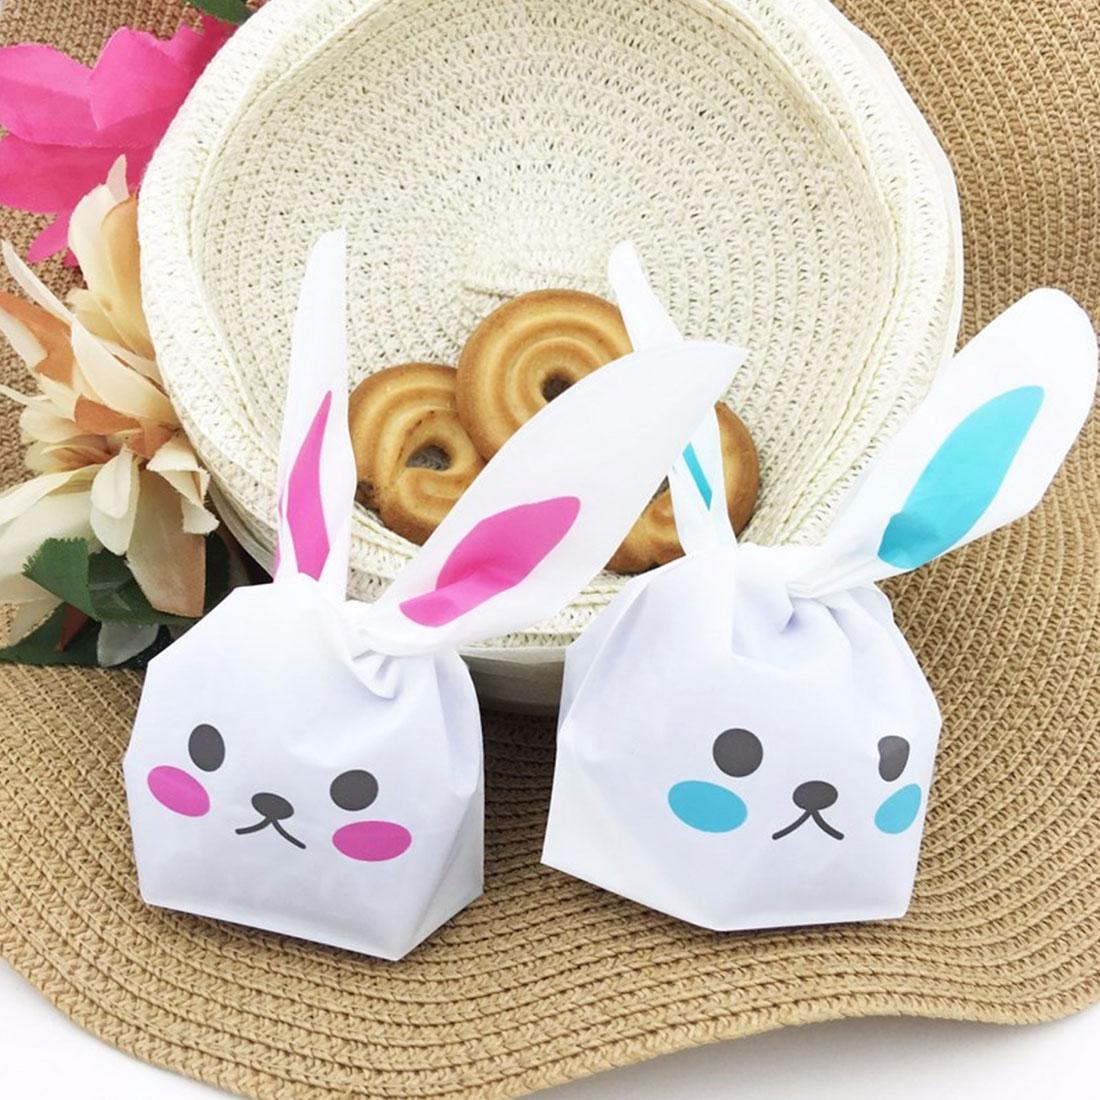 New 50pcs Cute Bunny Cookies Bag Rabbit Ear Plastic Candy Gift Bag Box Holloween Wedding Decor Christmas Party Supplies